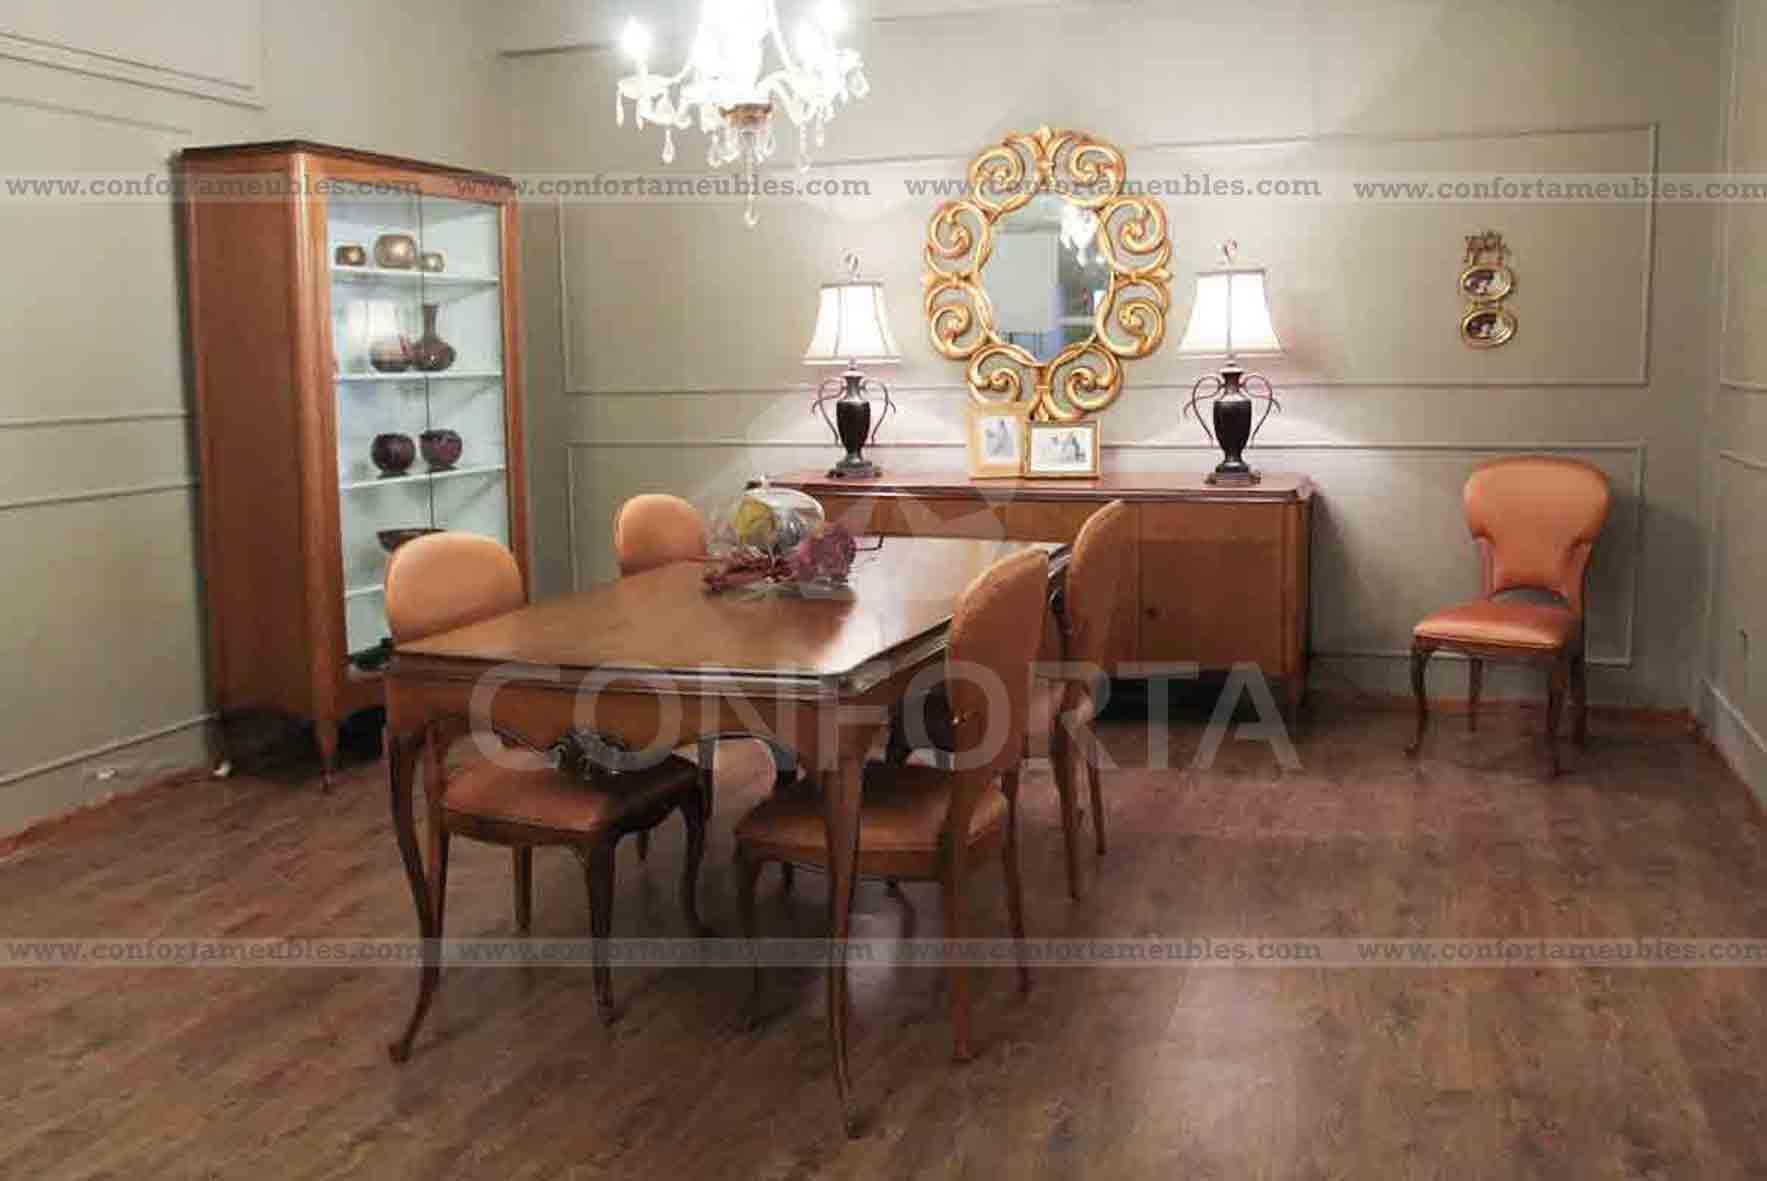 salles manger tunisie meubles et d coration tunisie